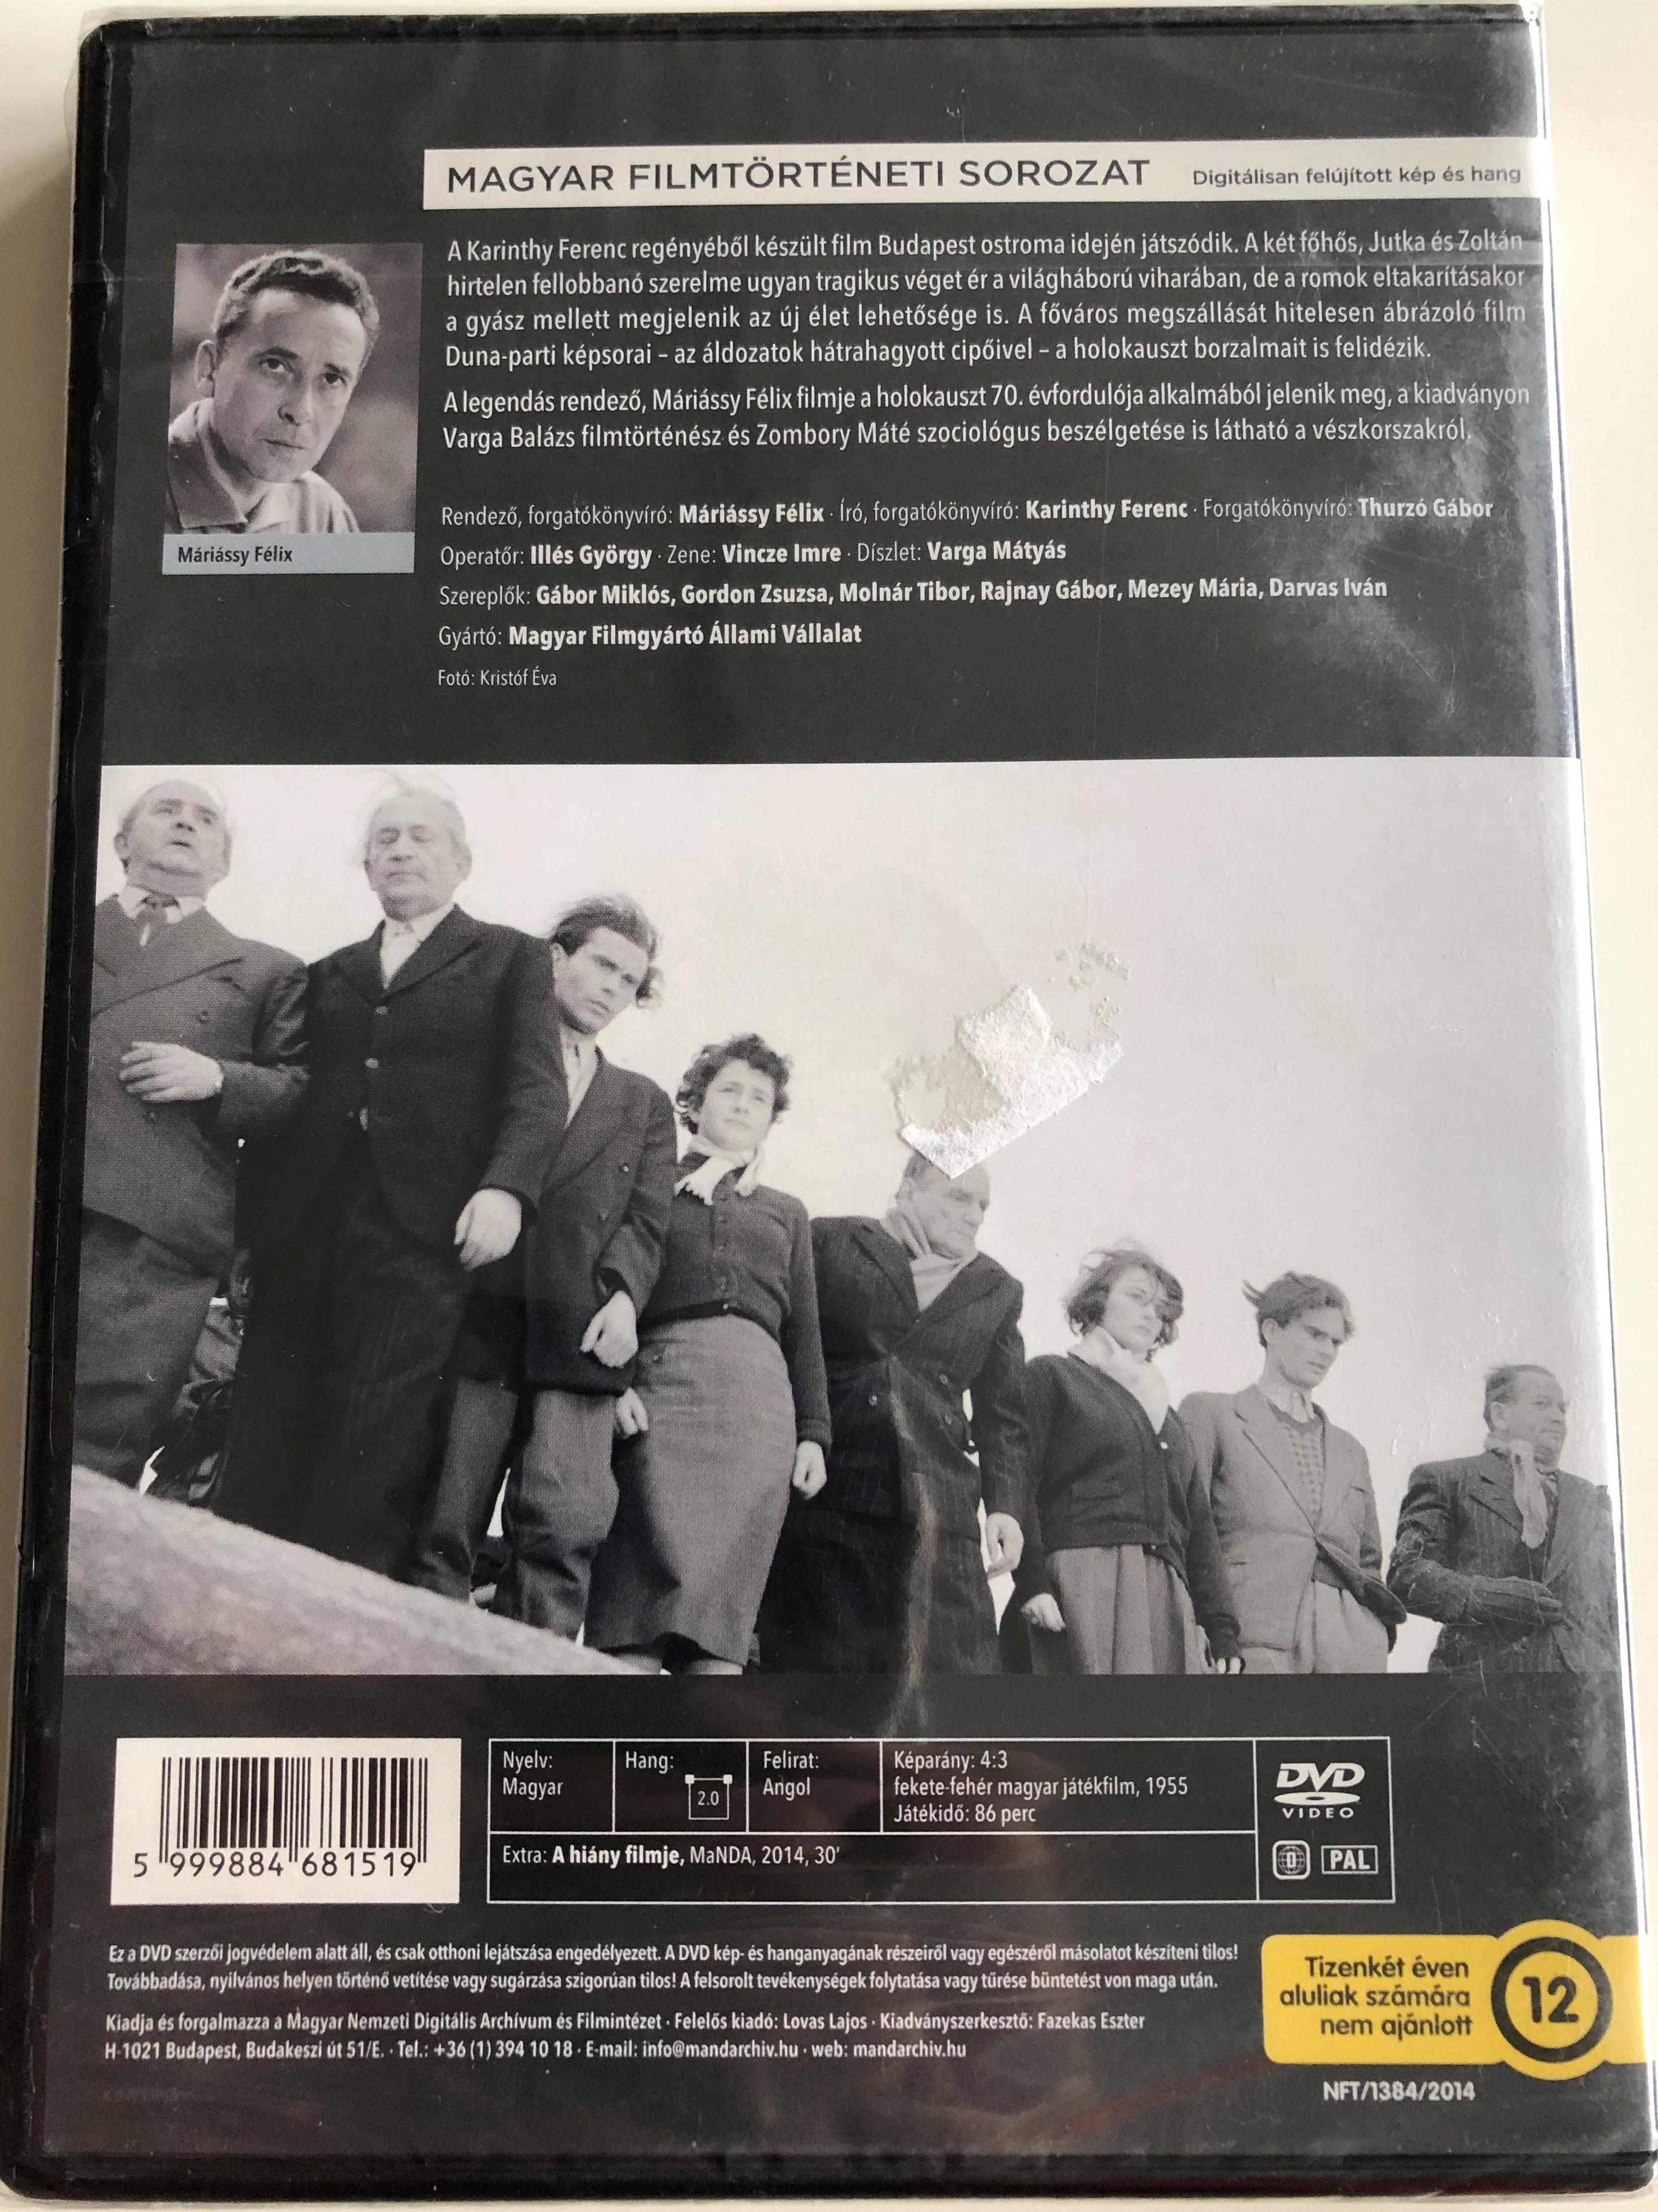 budapesti-tavasz-dvd-1955-budapest-spring-directed-by-m-ri-ssy-f-lix-2.jpg